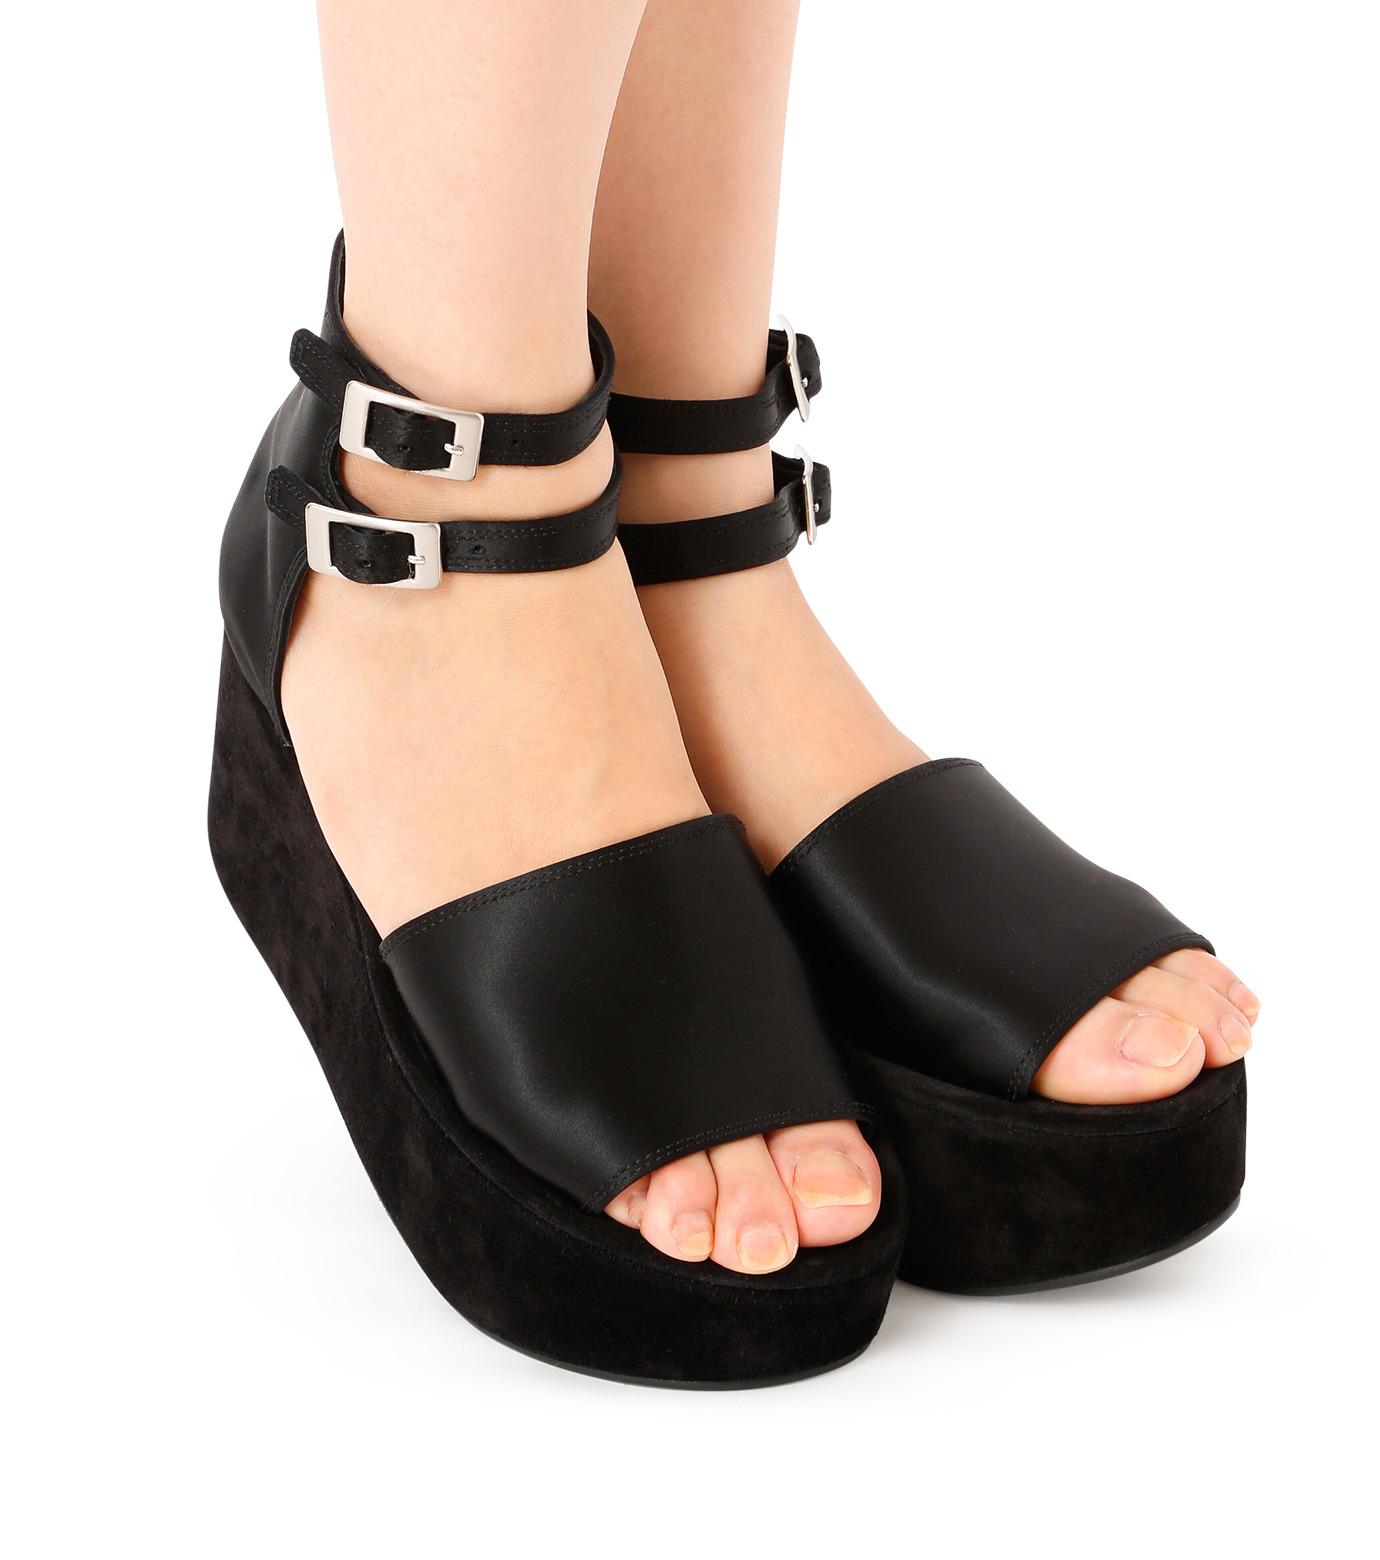 PIPPICHIC(ピッピシック)のSatin Sandal-BLACK(フラットシューズ/Flat shoes)-P16-PAUL25-L 拡大詳細画像5